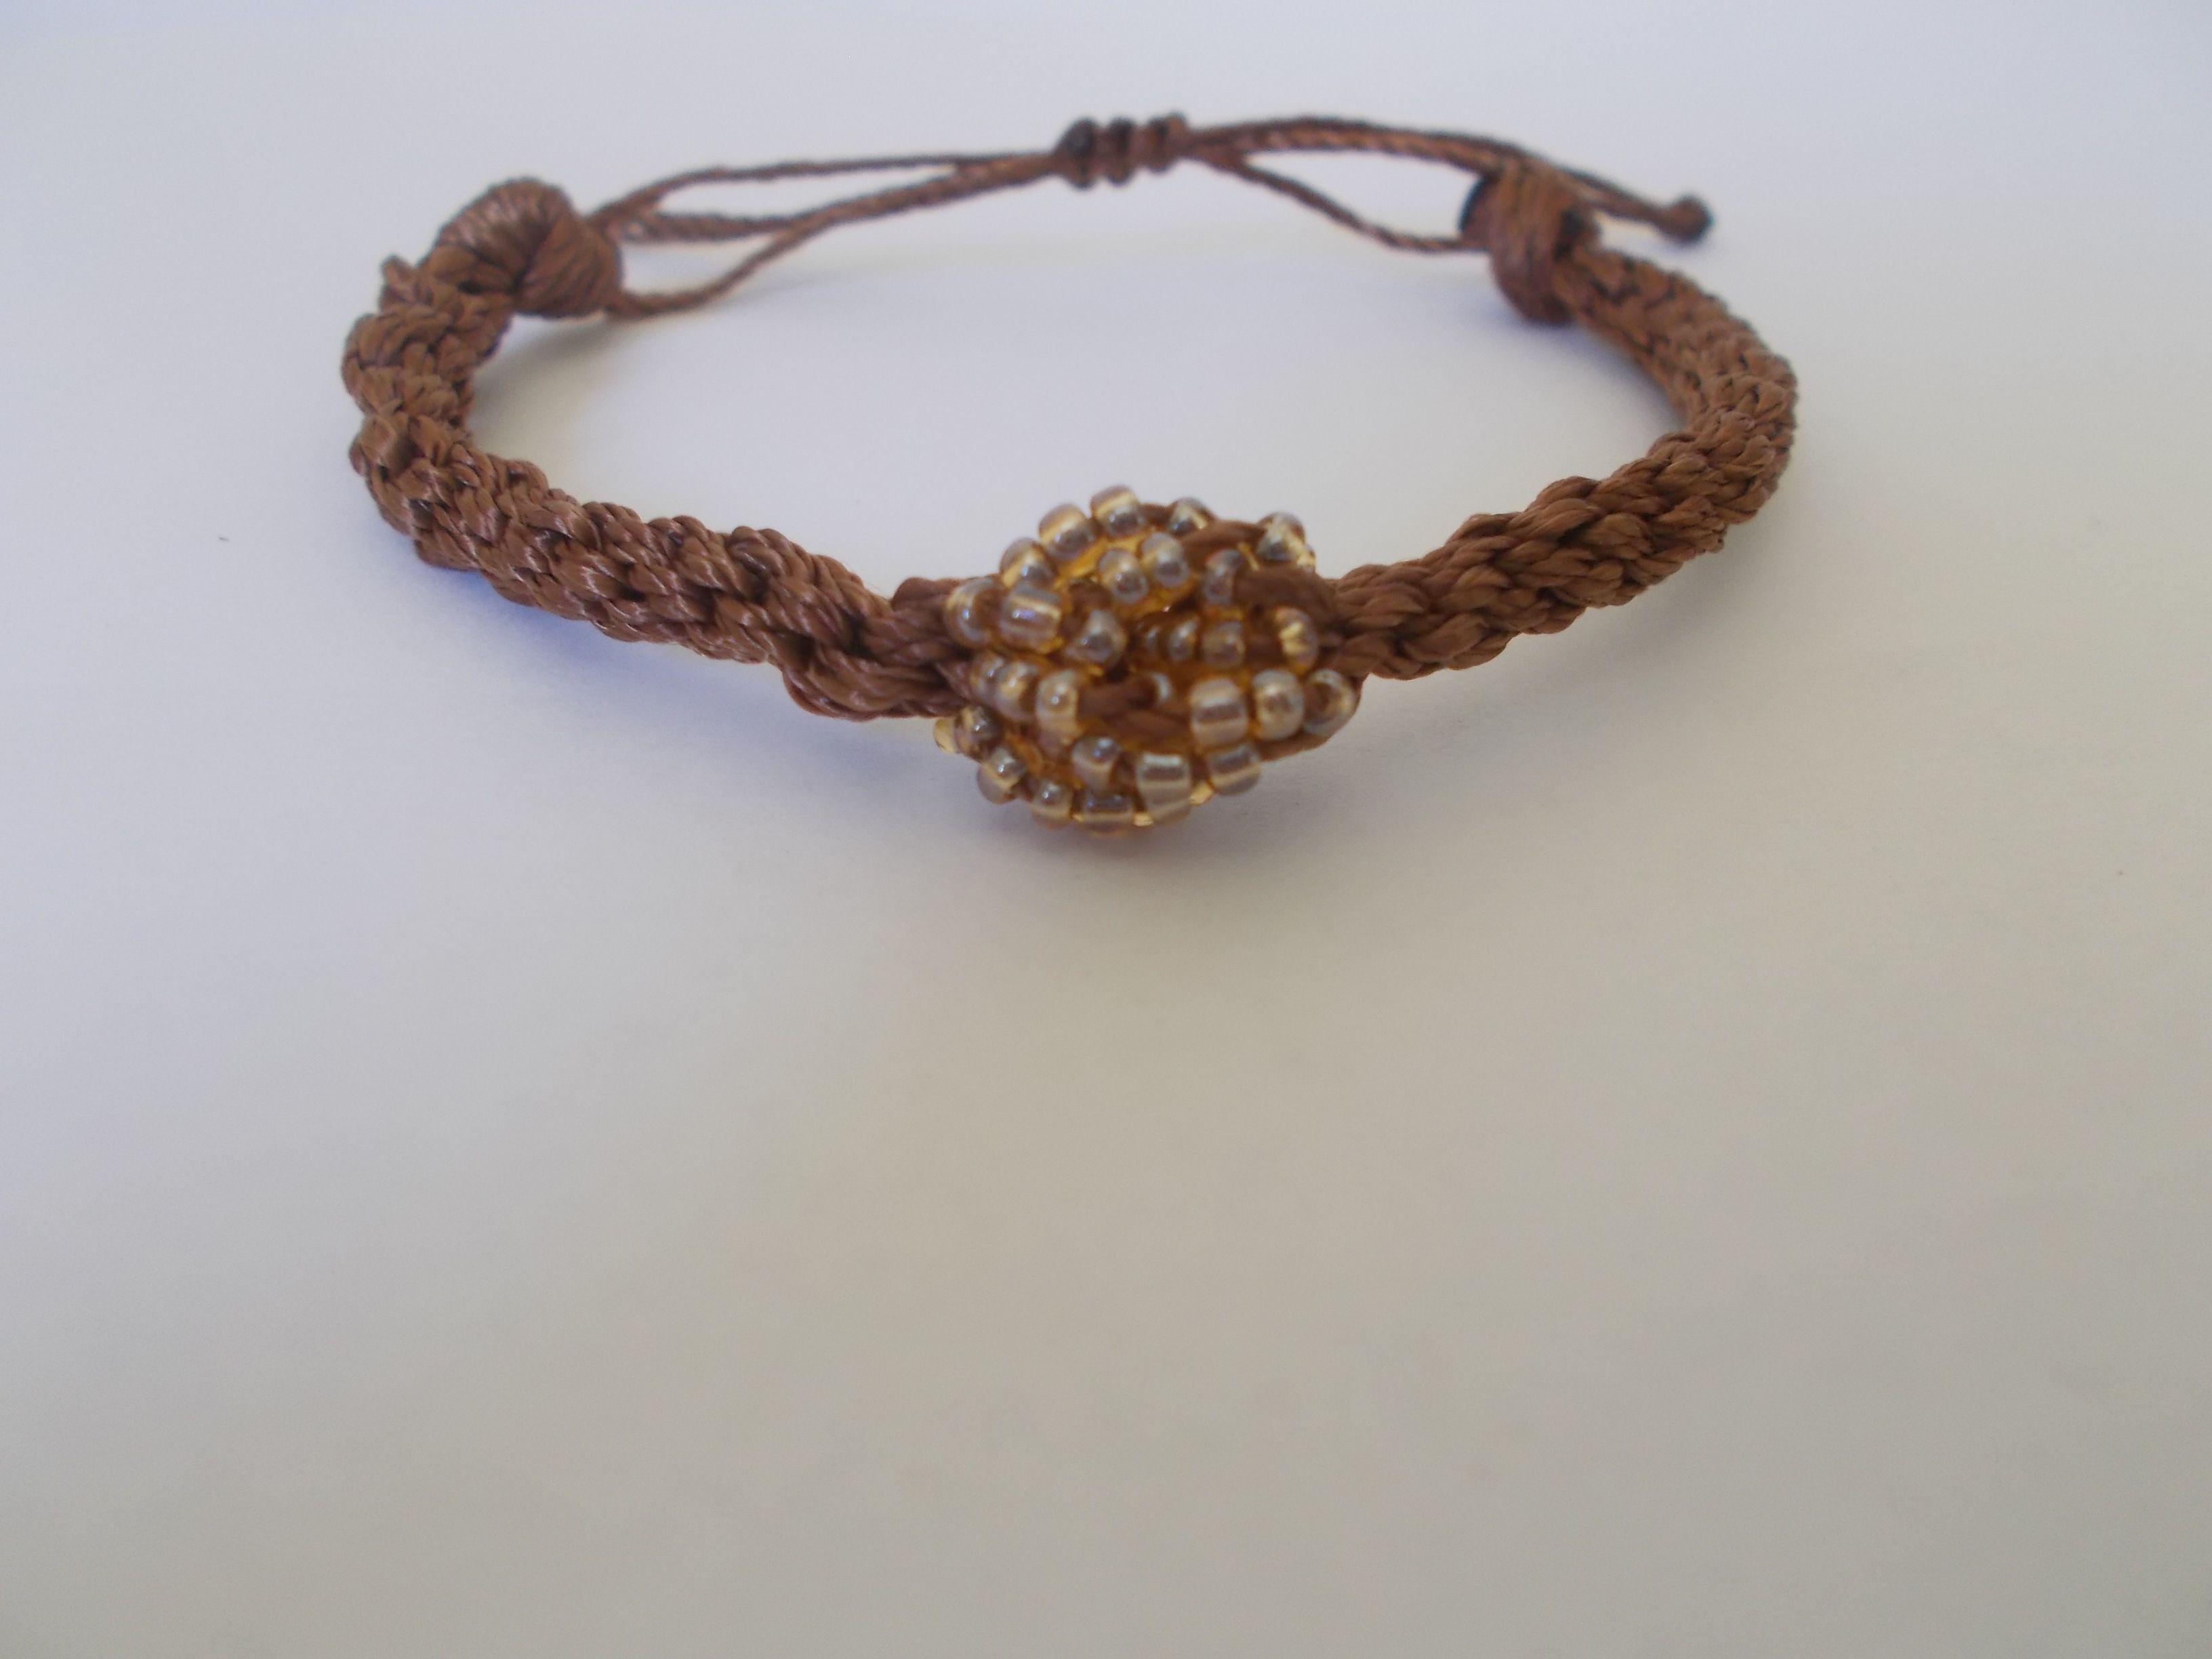 beads bracelets handame twist